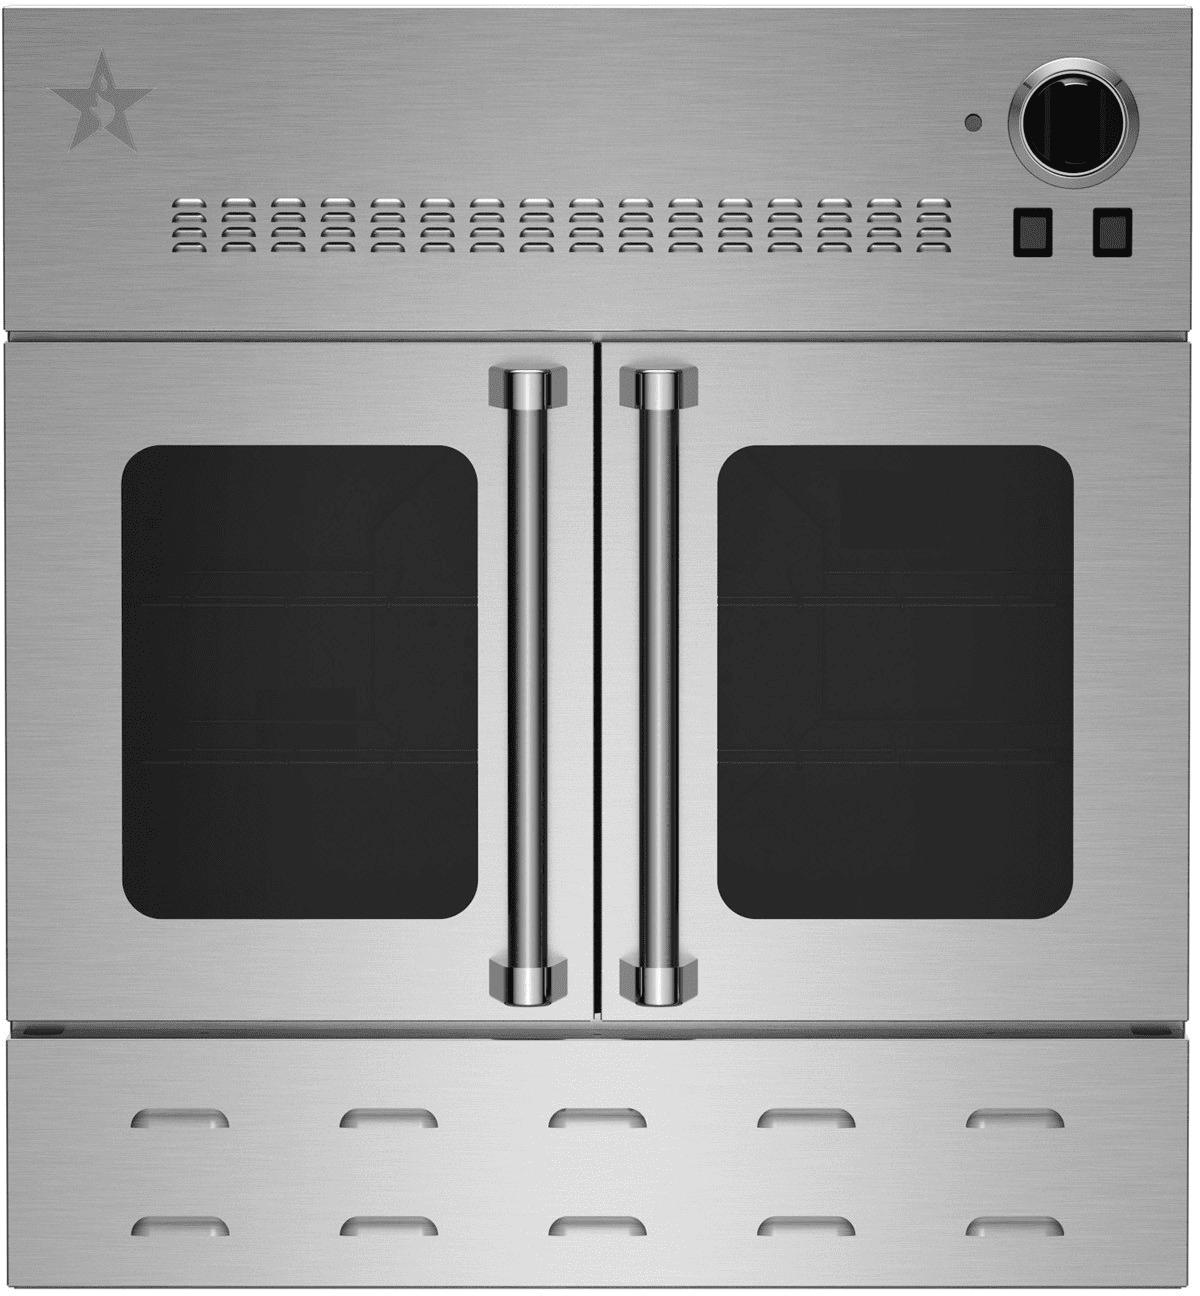 Bluestar Bwo30ags 30 Inch Single Gas Wall Oven With 25 000 Btu Burner True European Convection